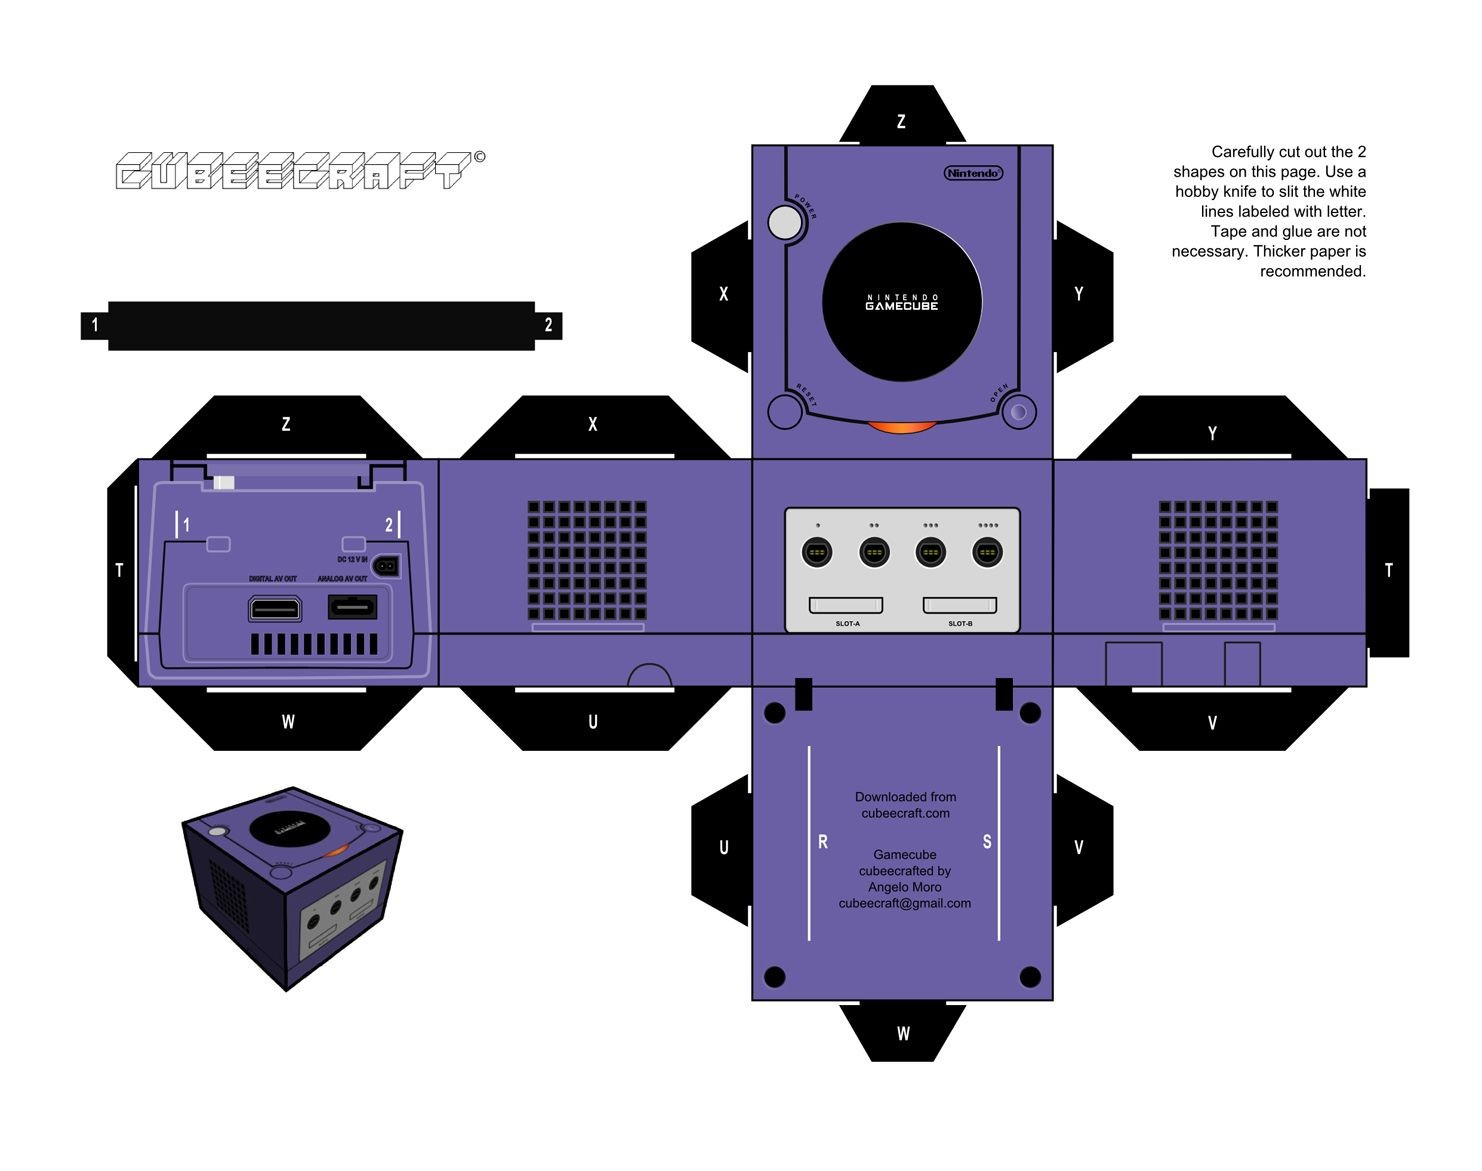 Nintendo Papercraft Cubeecrafts De Consolas Antiguas Nintendo Pinterest